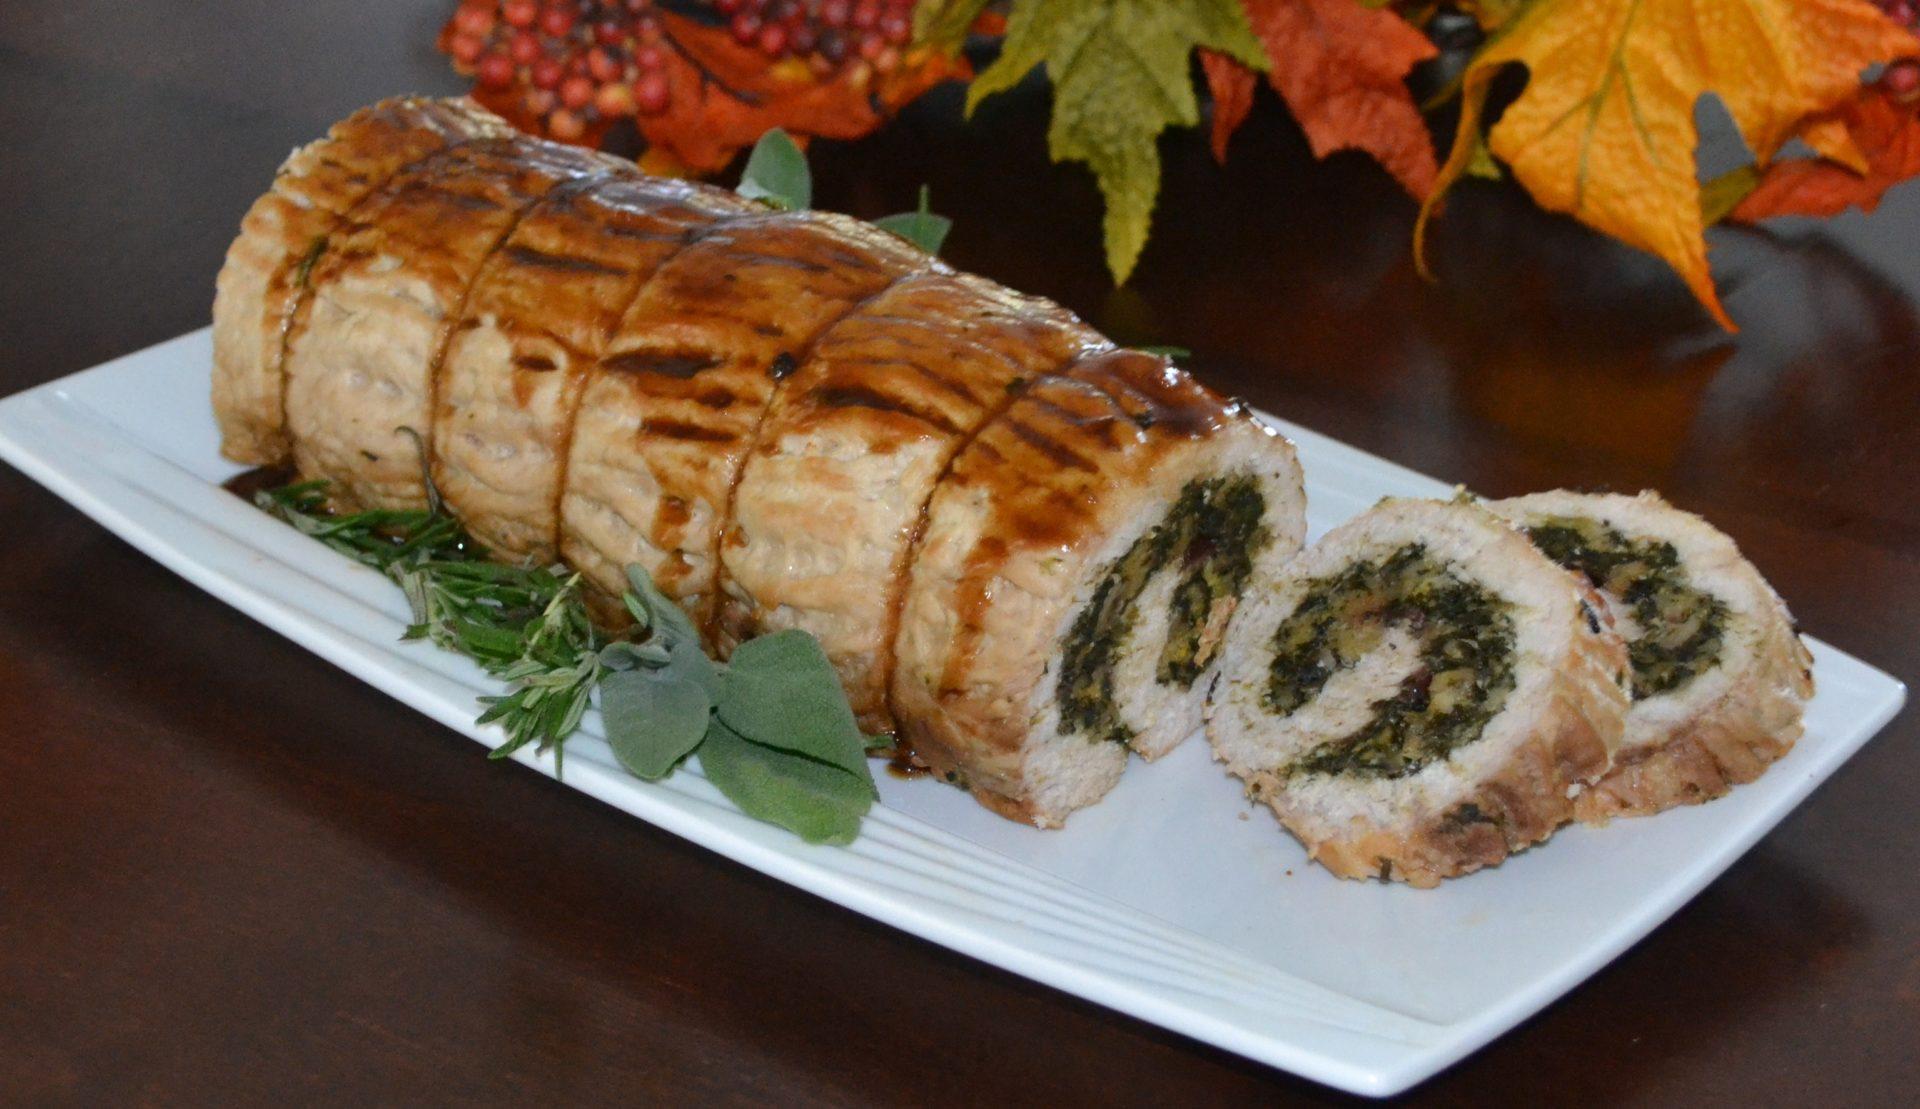 Spinach stuffed turkey breast